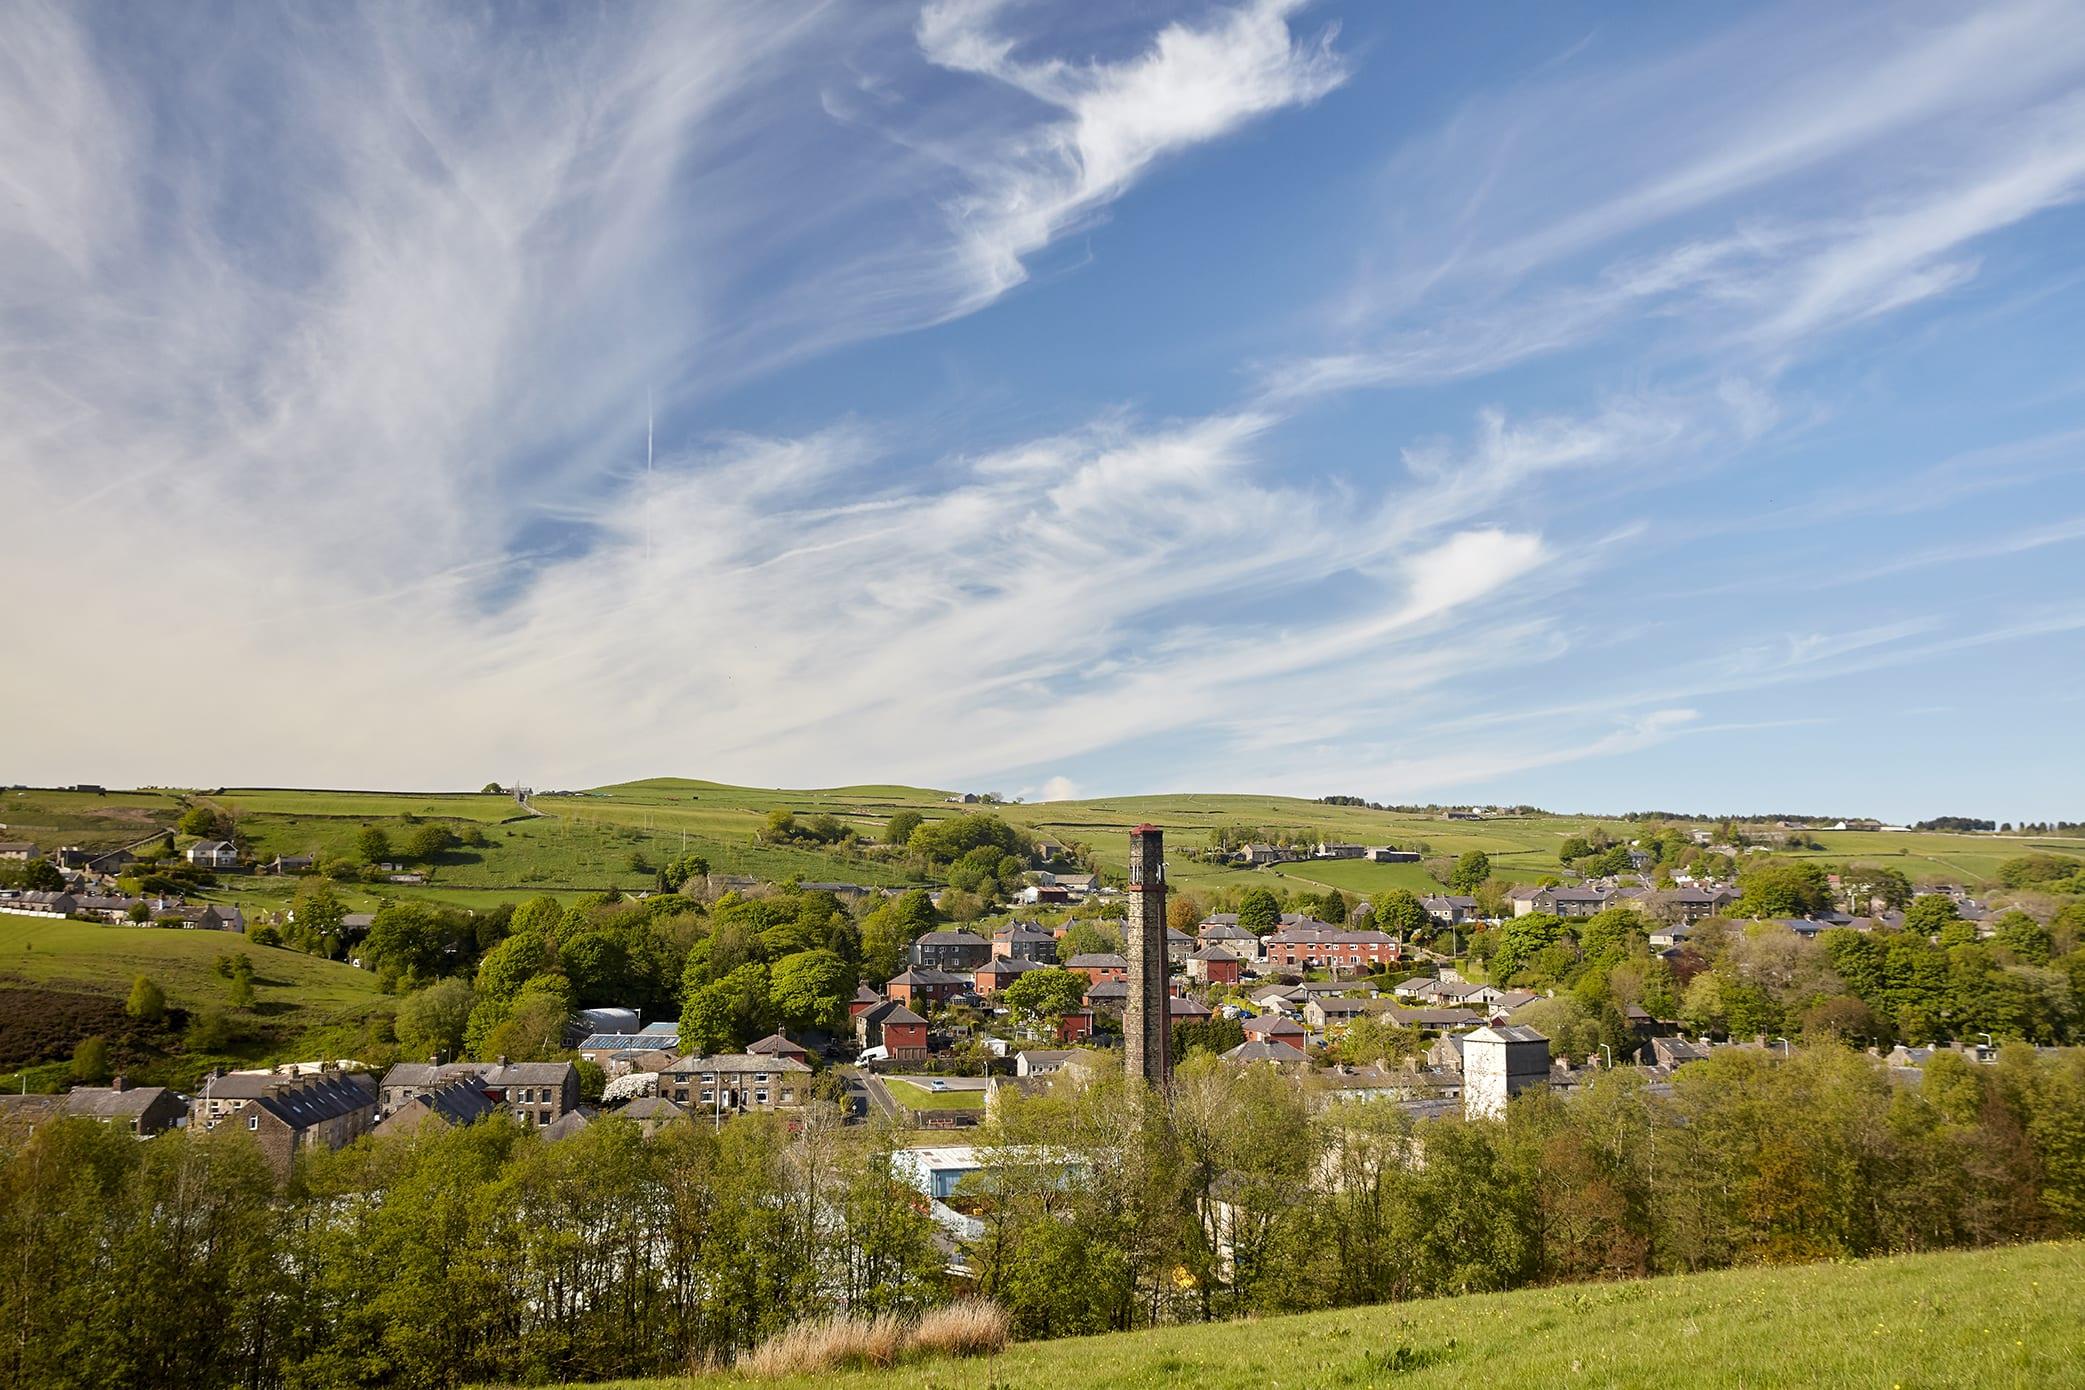 JJO plc Bacup view across valley, Lancashire